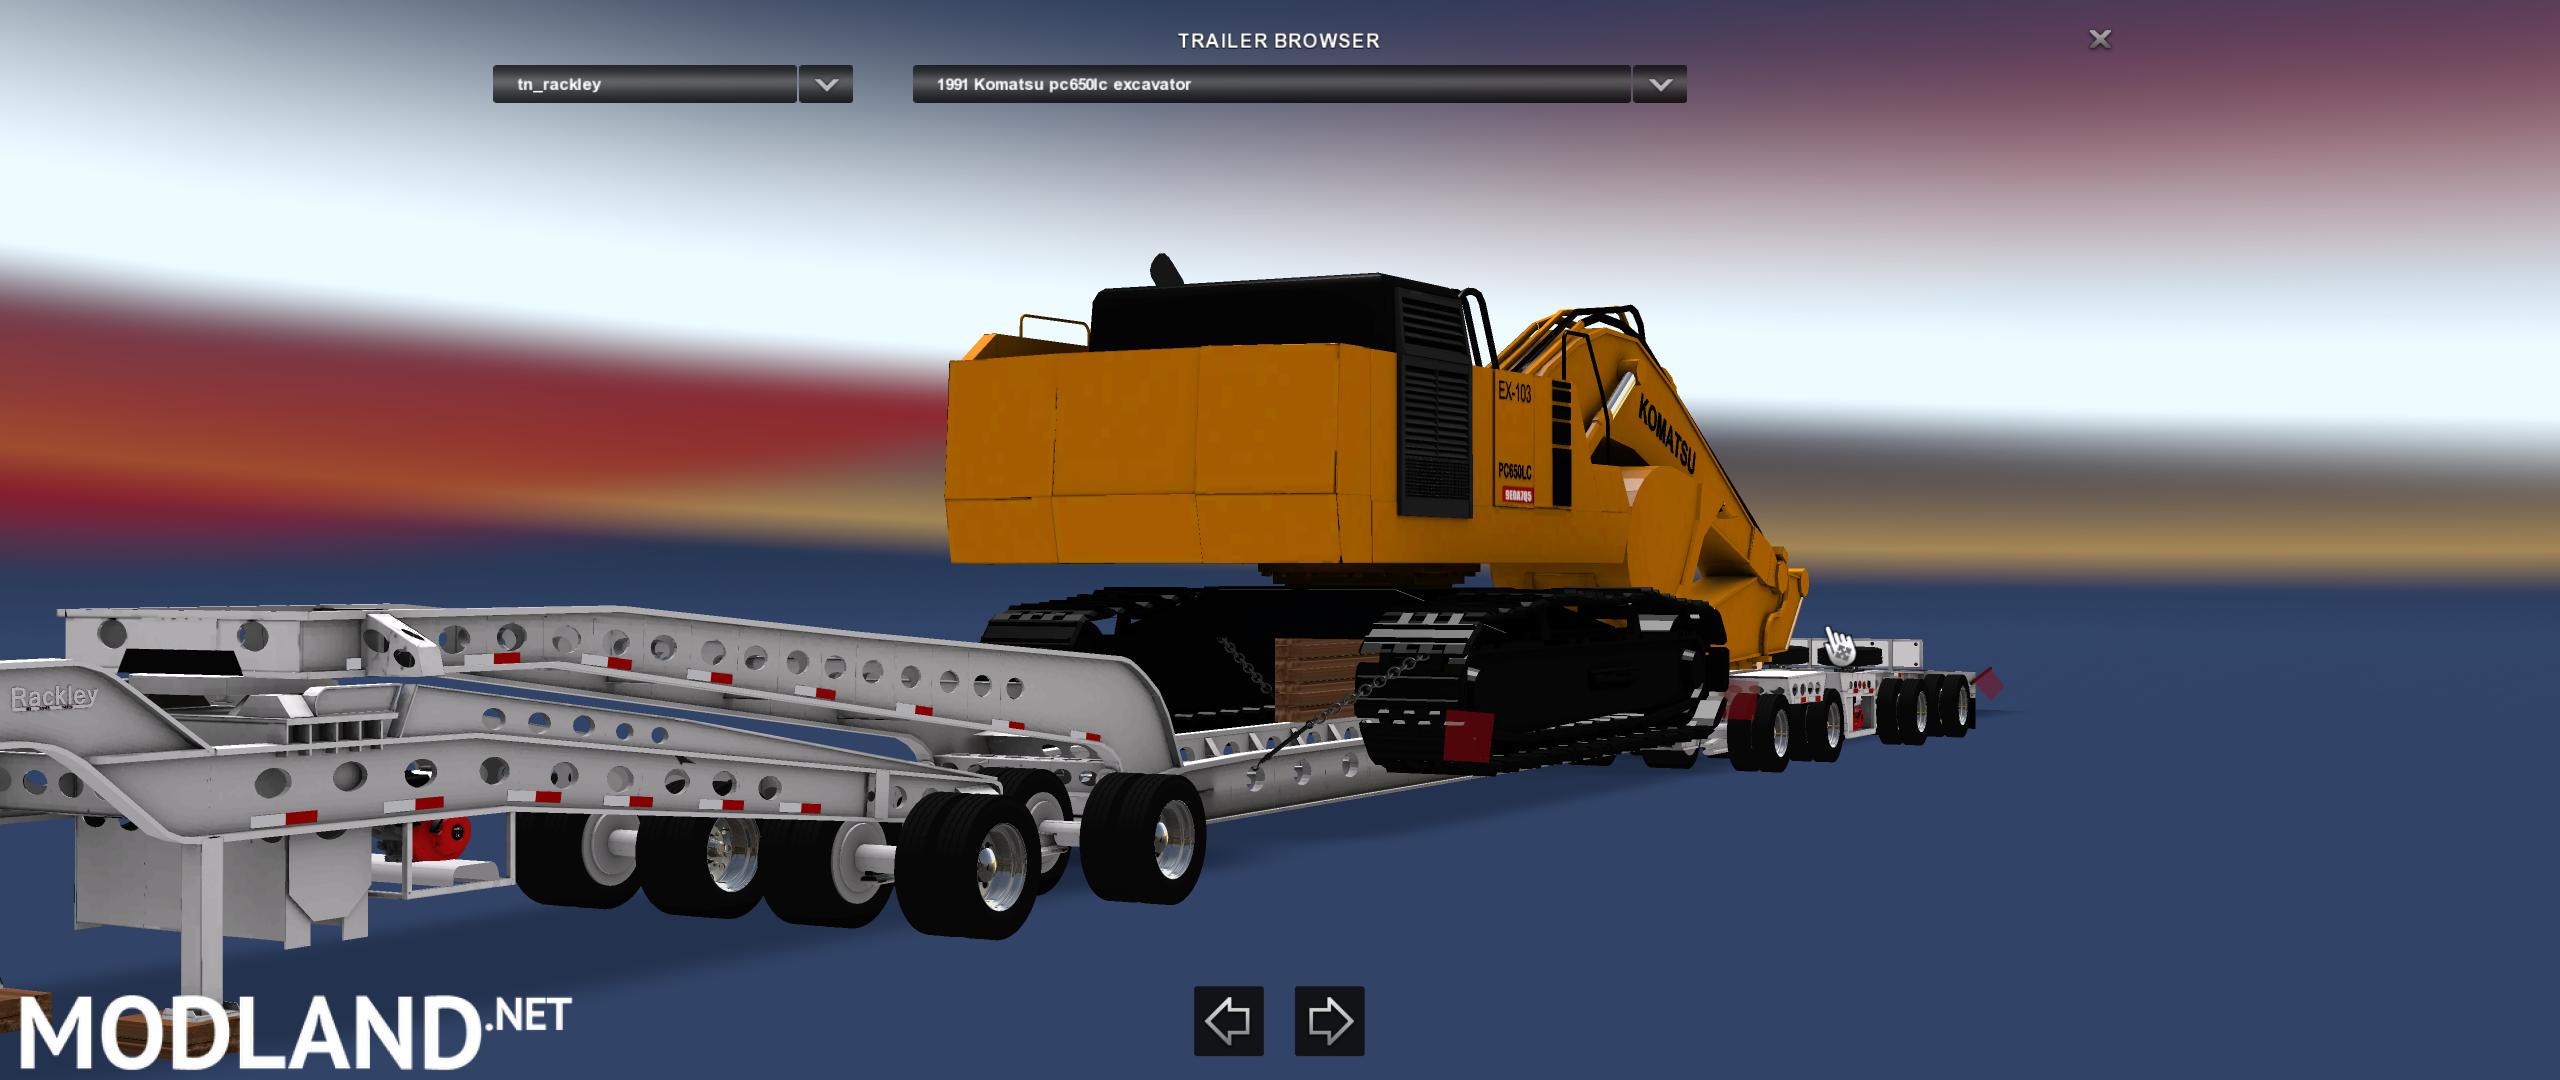 Rackley 9 Axle mod for American Truck Simulator, ATS